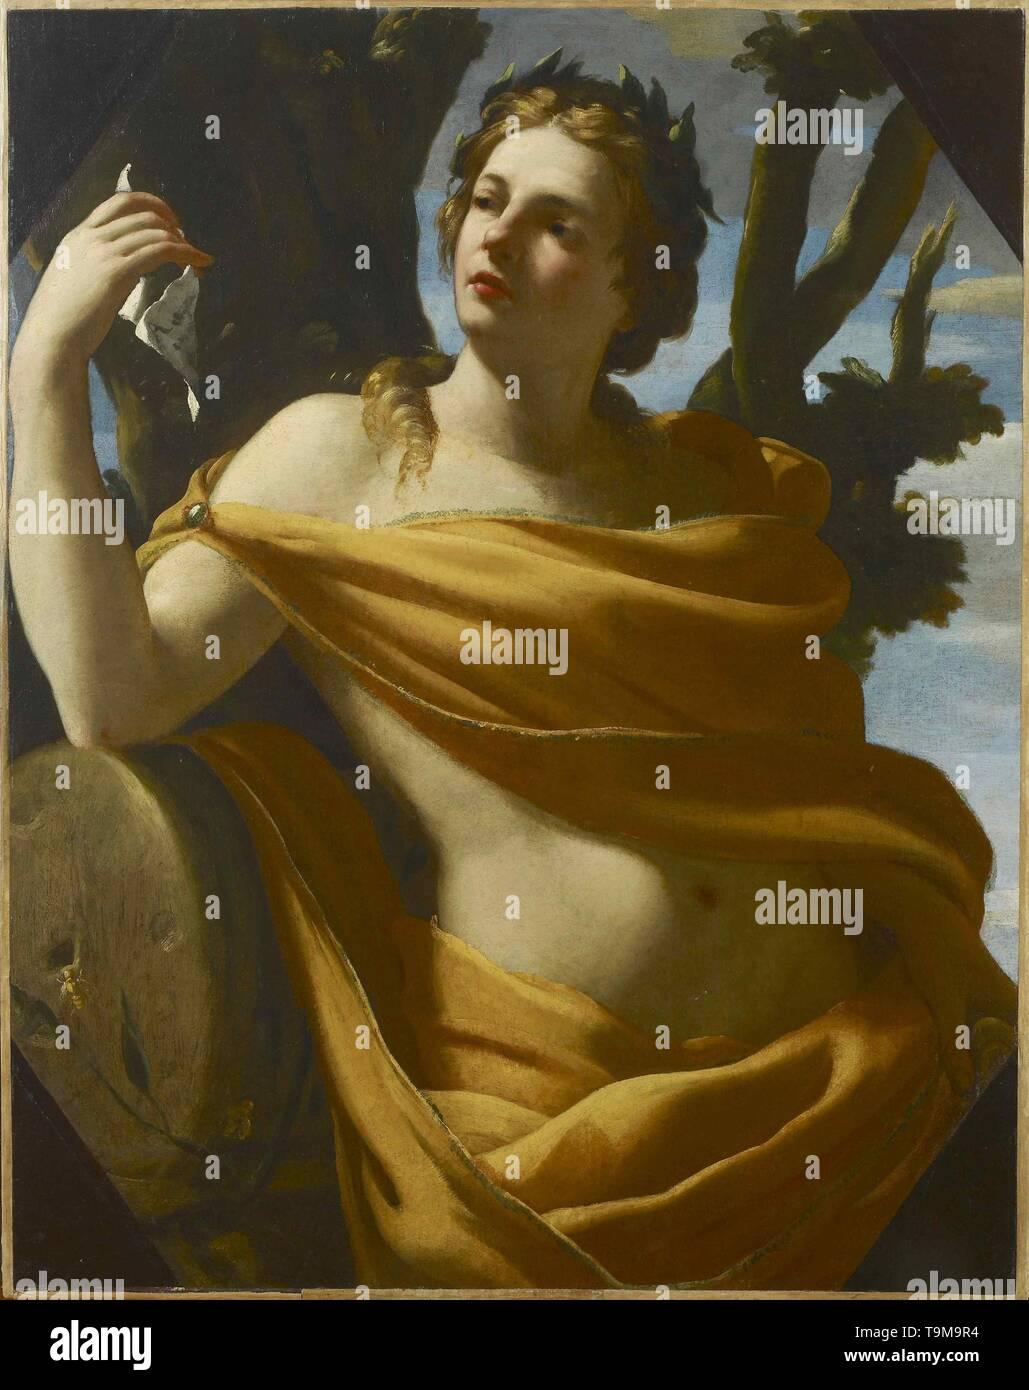 Apollo. Museum: Collection Motais de Narbonne. Author: Charles Mellin. - Stock Image